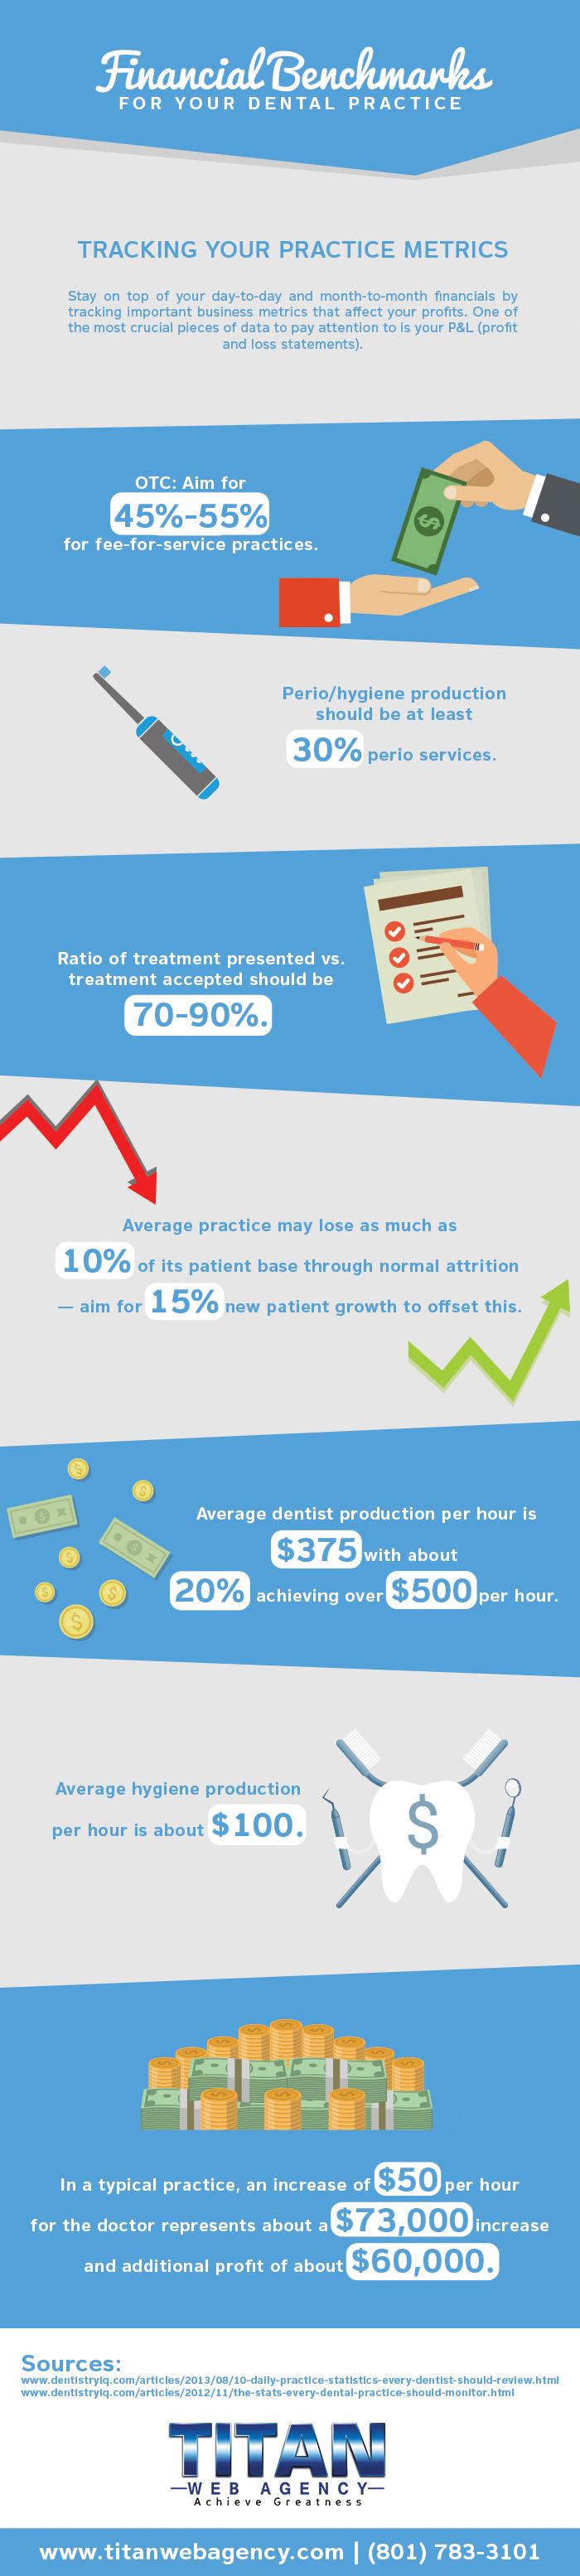 financials dental practices